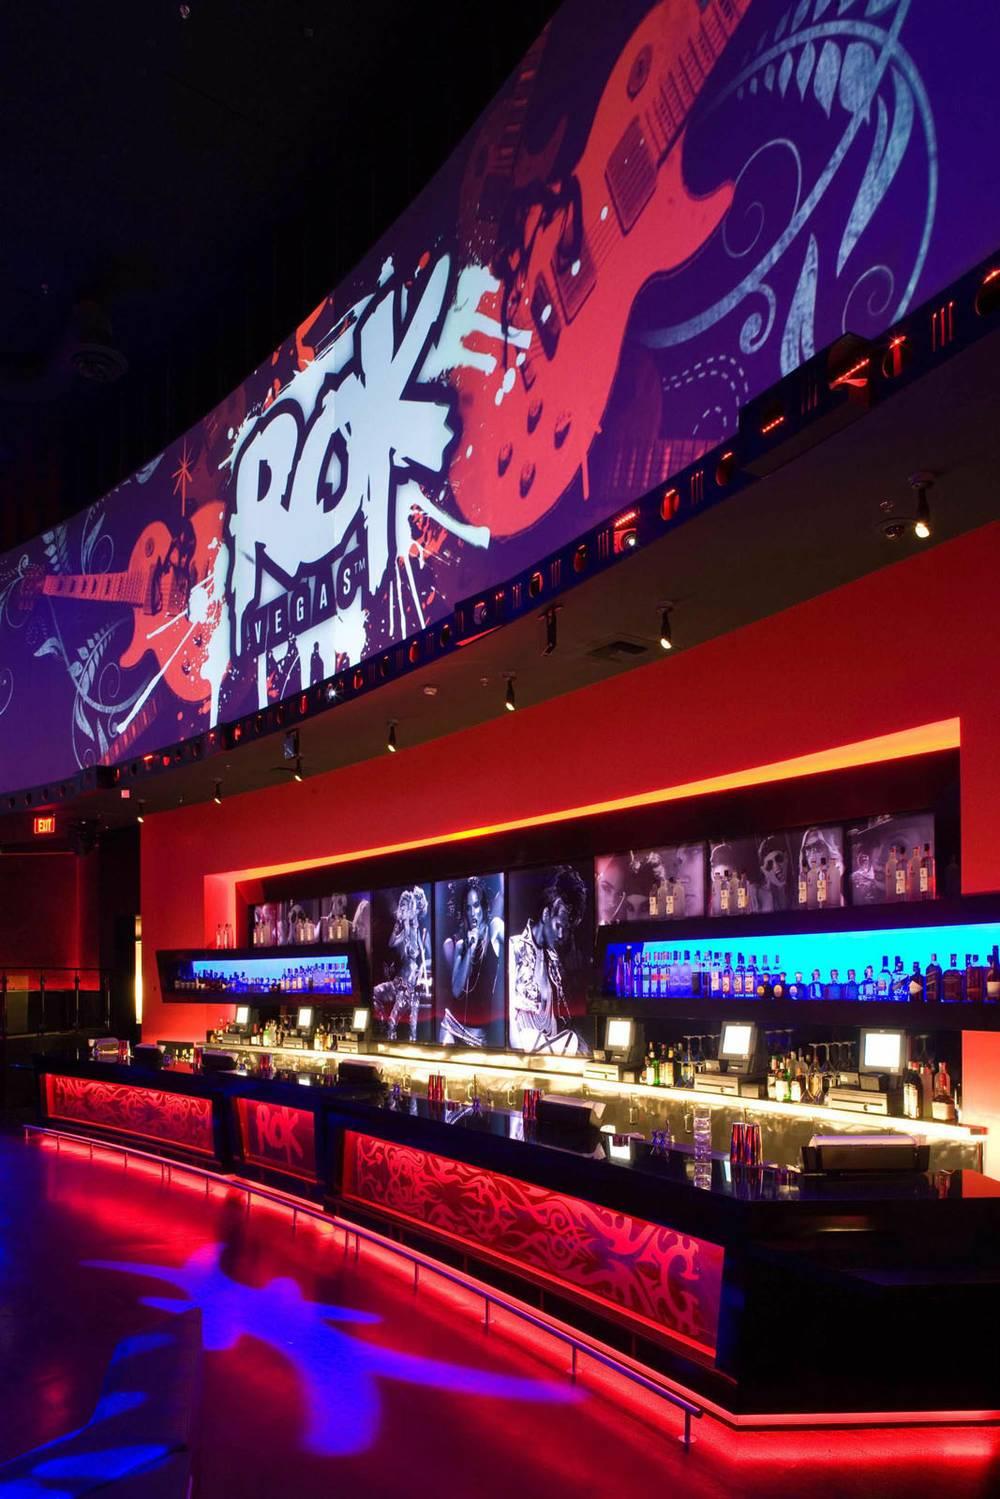 Chances nightclub